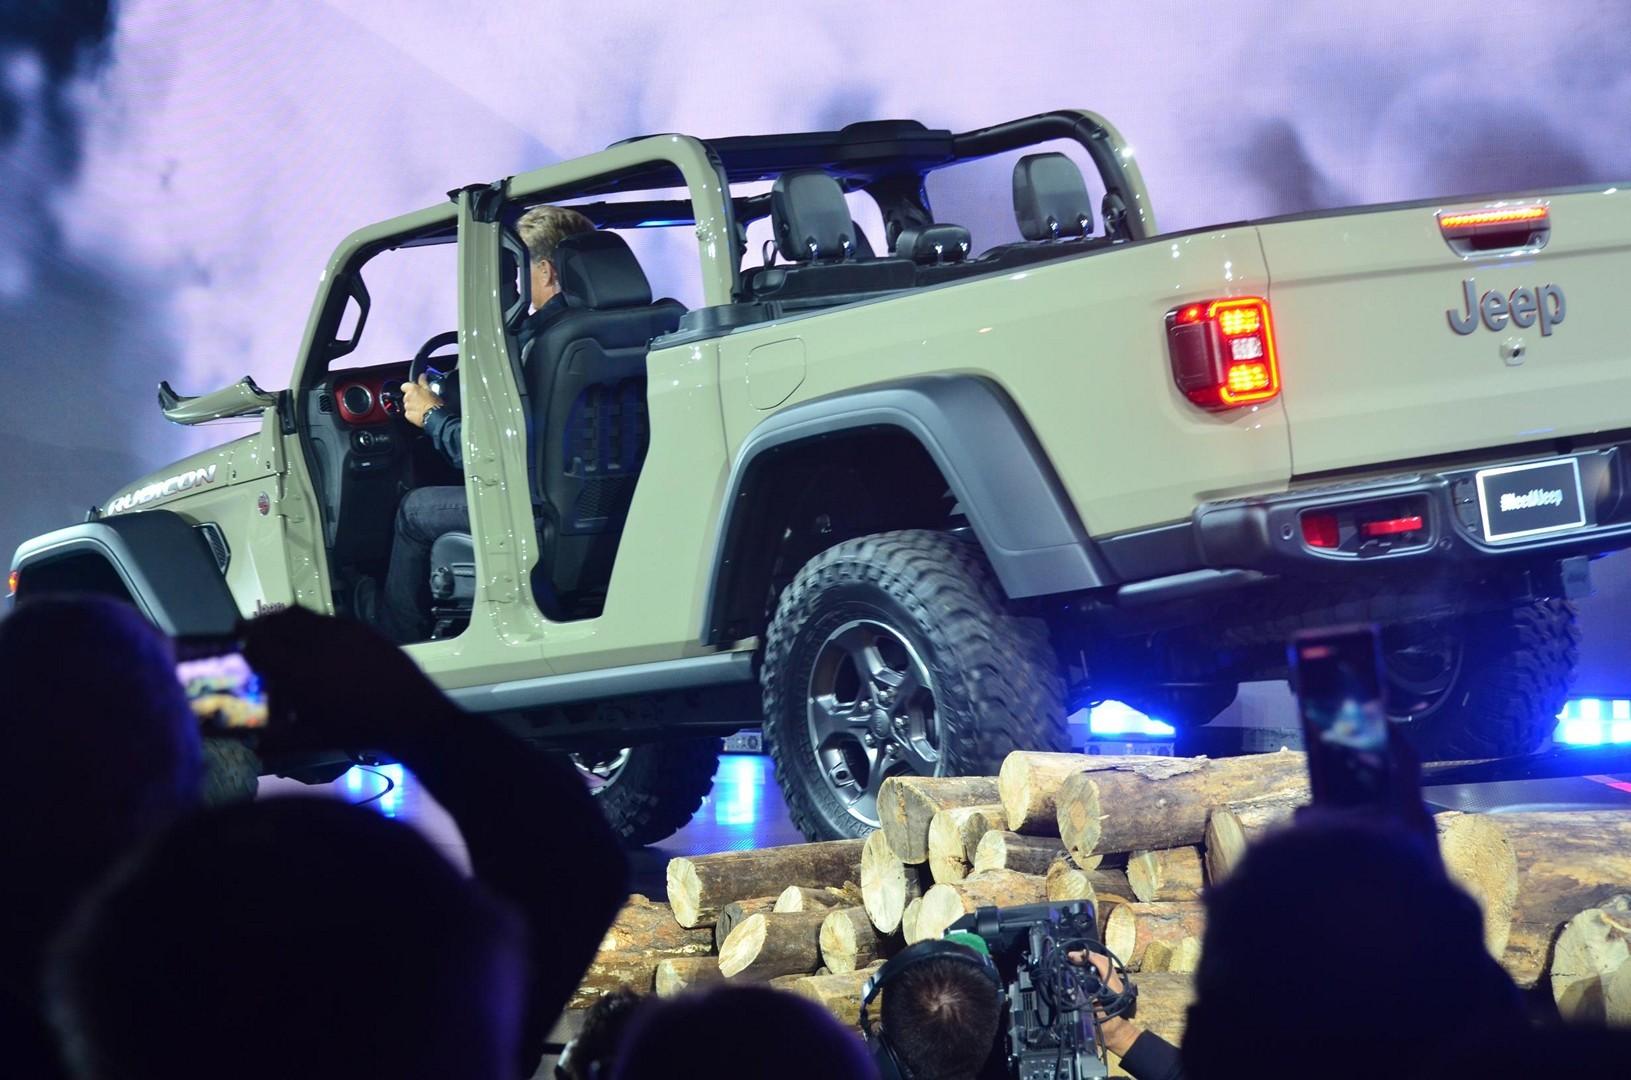 2020 Jeep Gladiator Looks Impressive at the LA Auto Show ...